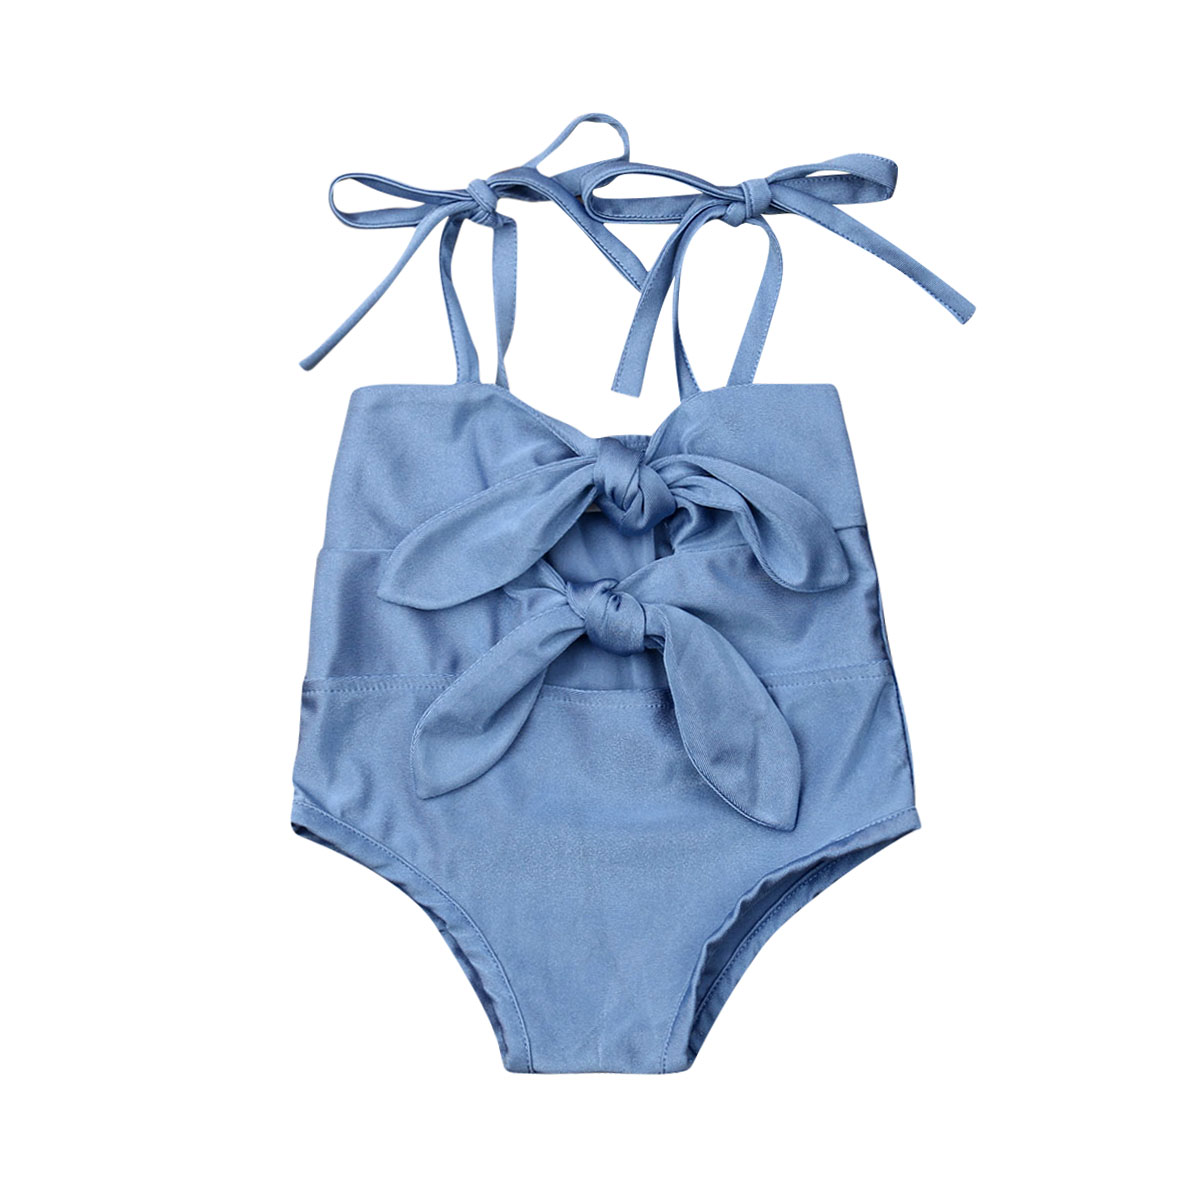 Baby Girls Kid One-Piece Swimsuit Swimwear Bikini Monokini Bathing Suit Beachwear Summer